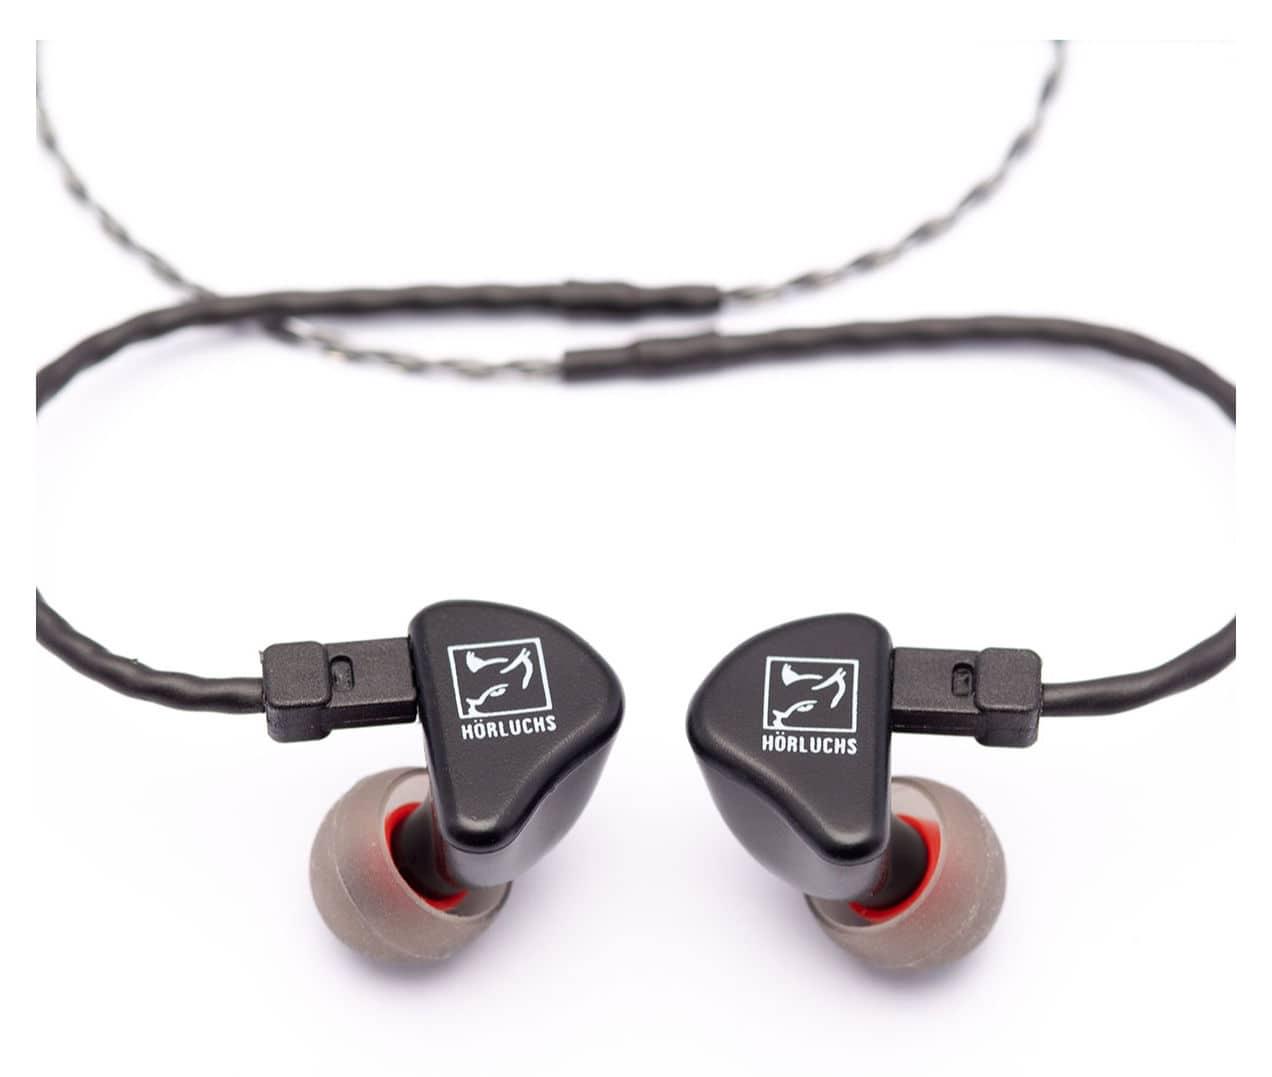 Kopfhoerer - Hörluchs HL1200 In Ear Hörer - Onlineshop Musikhaus Kirstein